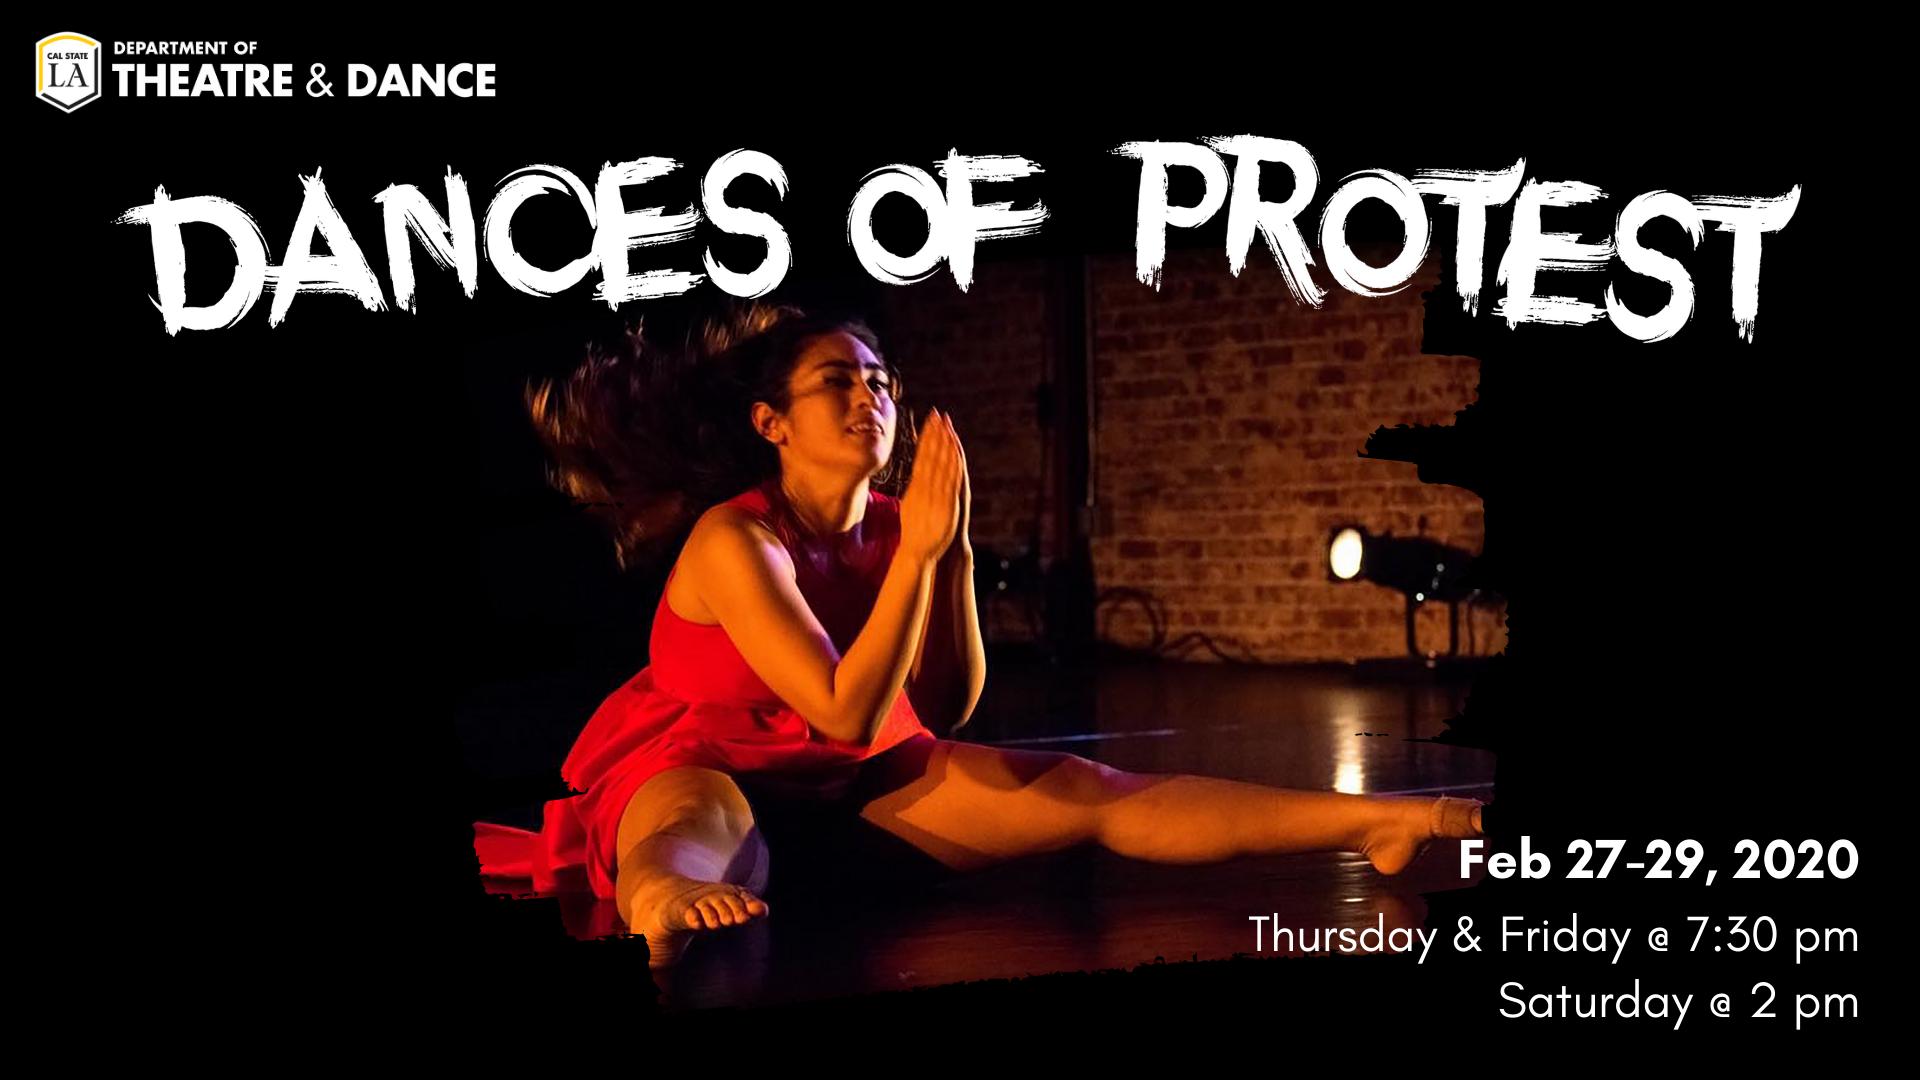 Dances of Protest